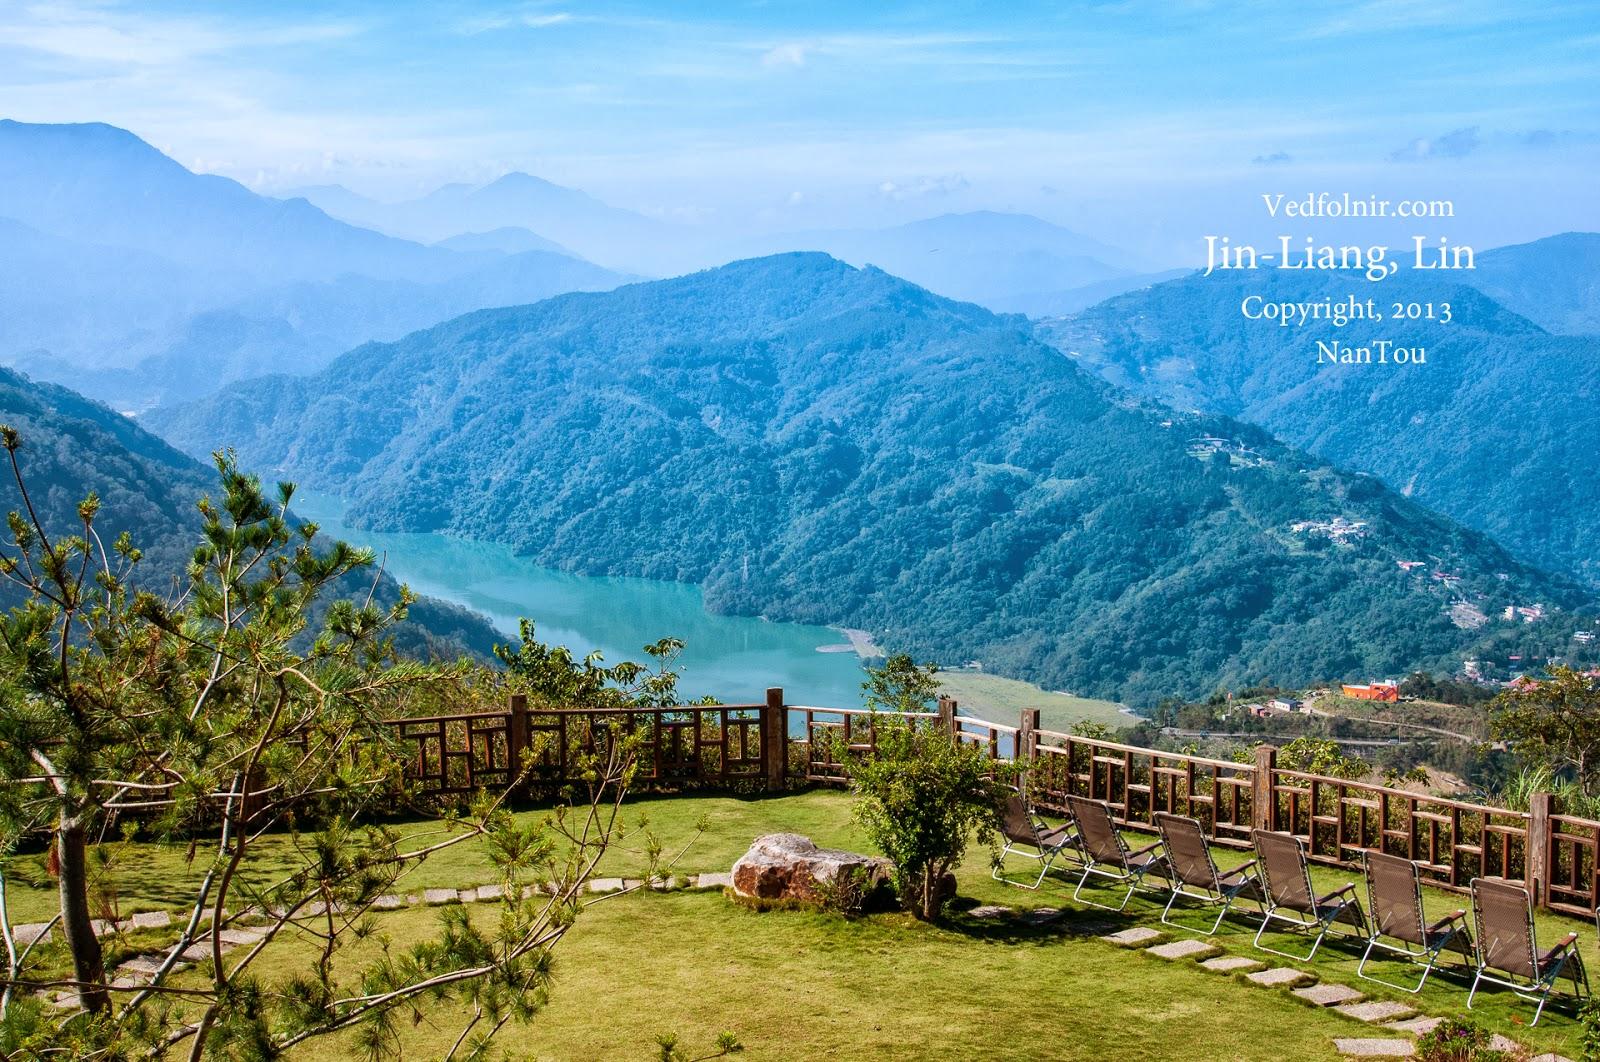 Junyi View Homestay Villa Cingjing Nantou Taiwan Republic of China 南投清境「駿亦景觀民宿」住宿推薦與旅遊心得介紹